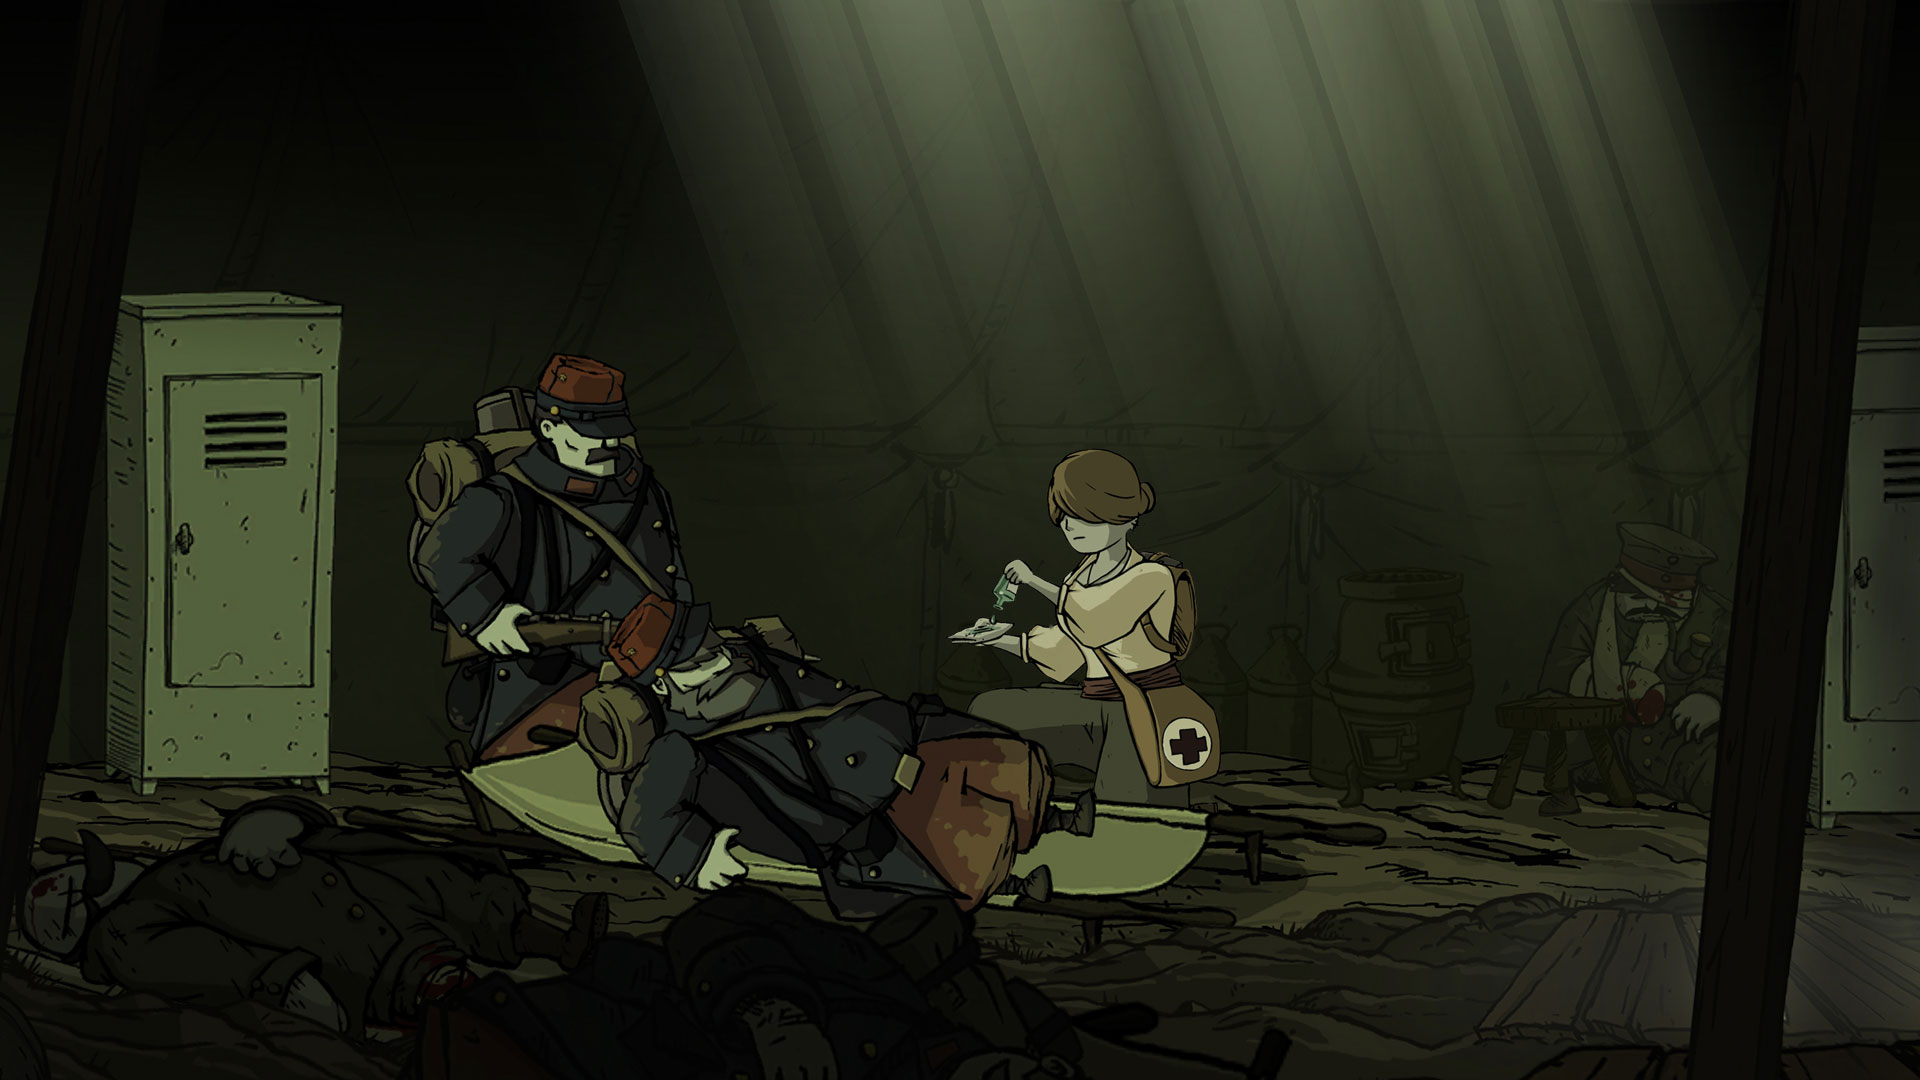 Offizieller Screenshot von Valiant Hearts: The Great War. Quelle: https://www.ubisoft.com/de-de/game/valiant-hearts/